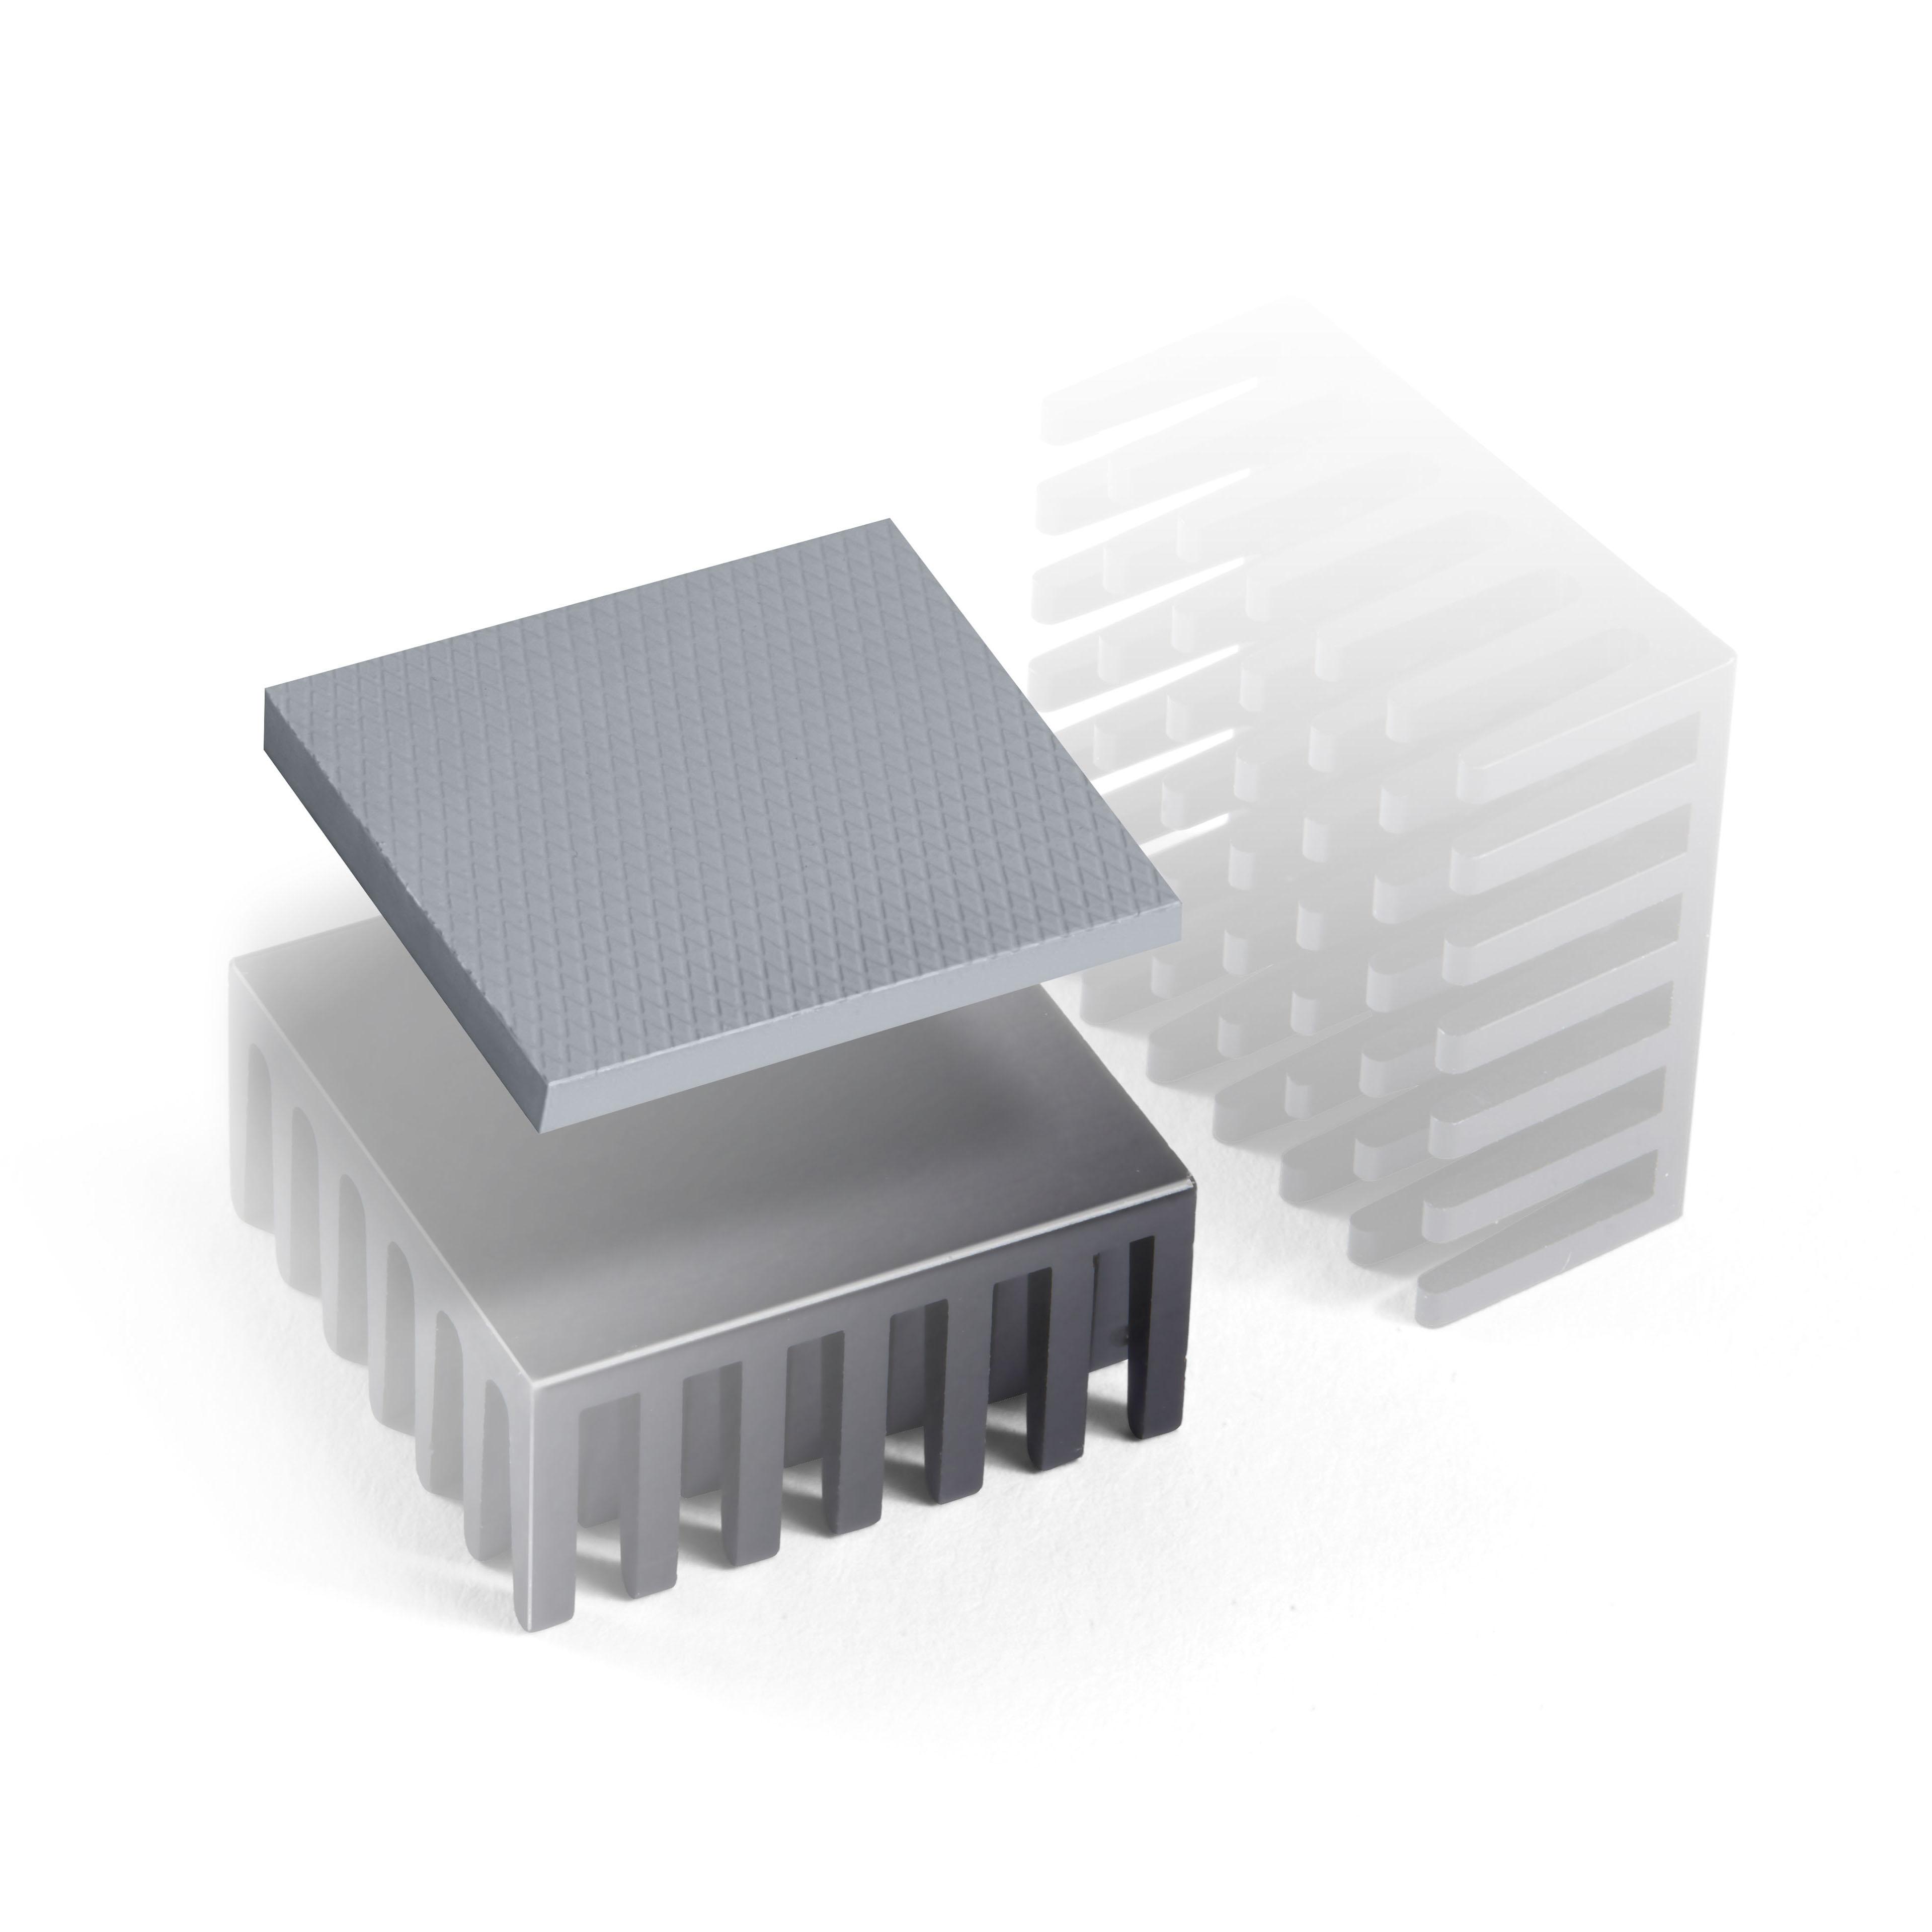 ThermaGap_569_ThermalPad_Heatsink_V1A